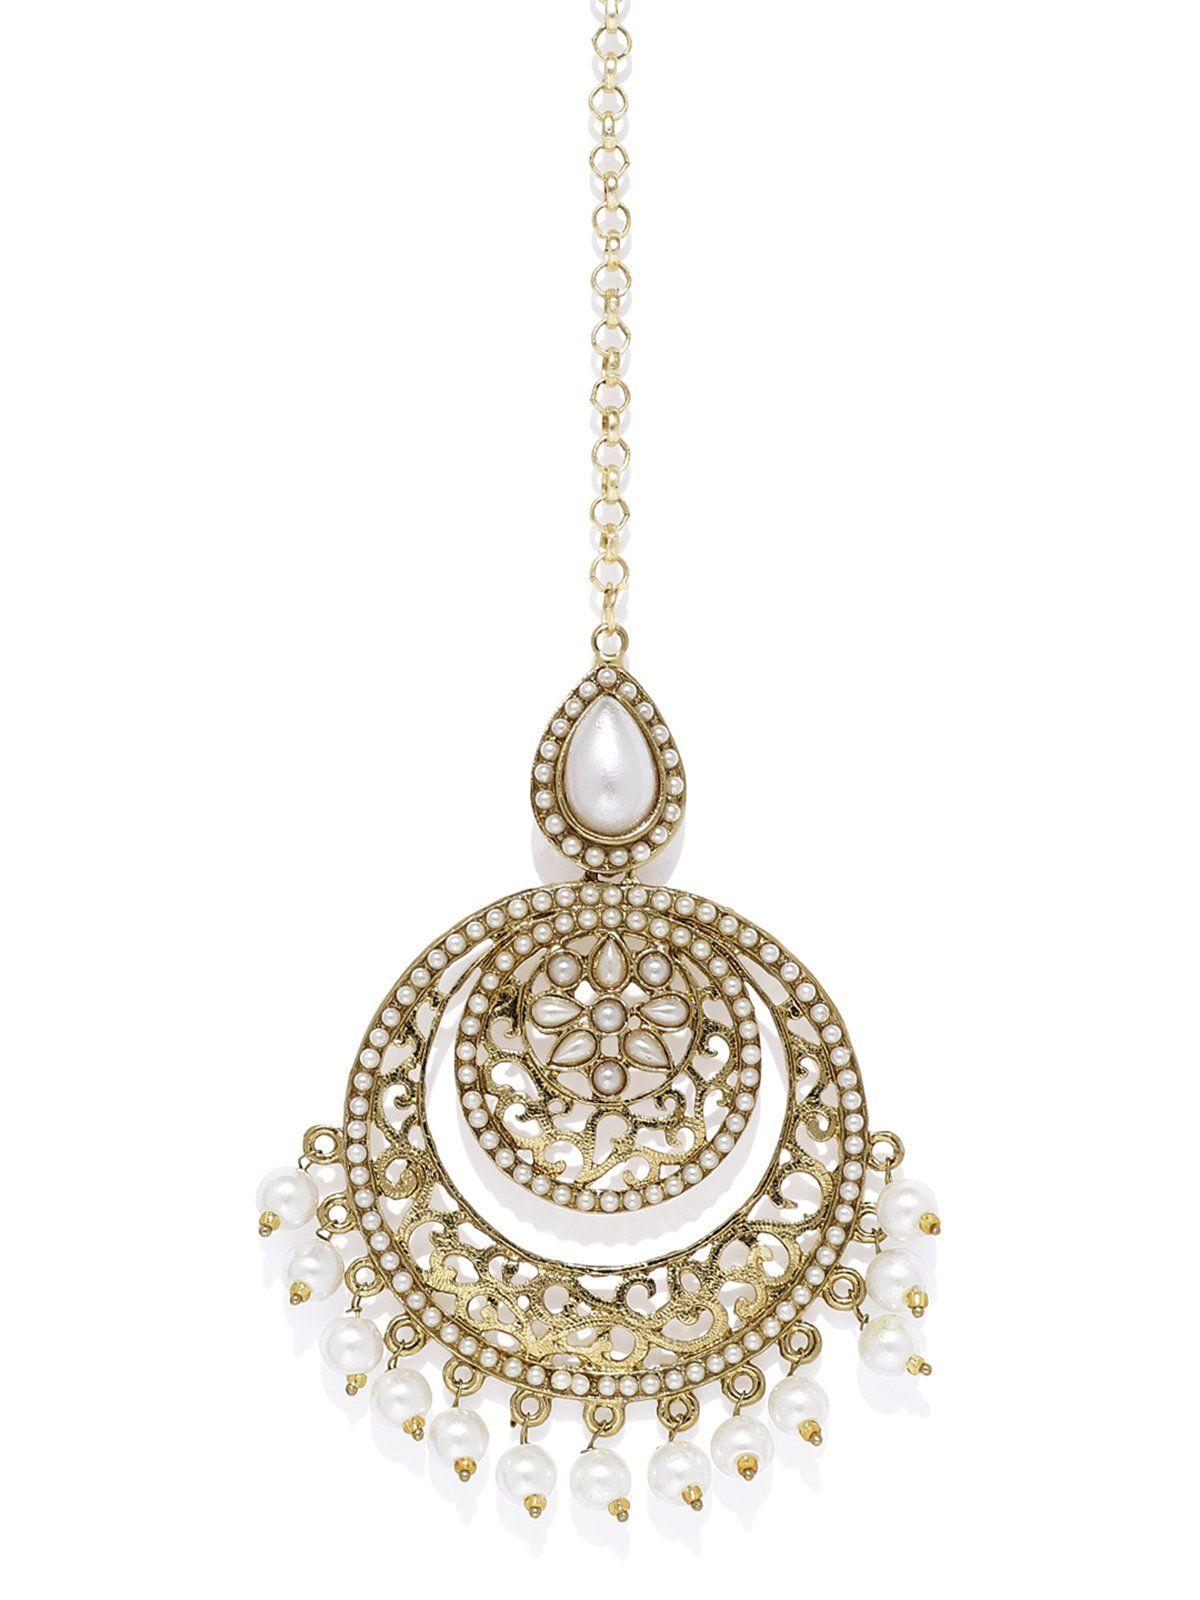 Antique Gold Tone Pearls Traditional Maang Tikka Zaveri Pearls